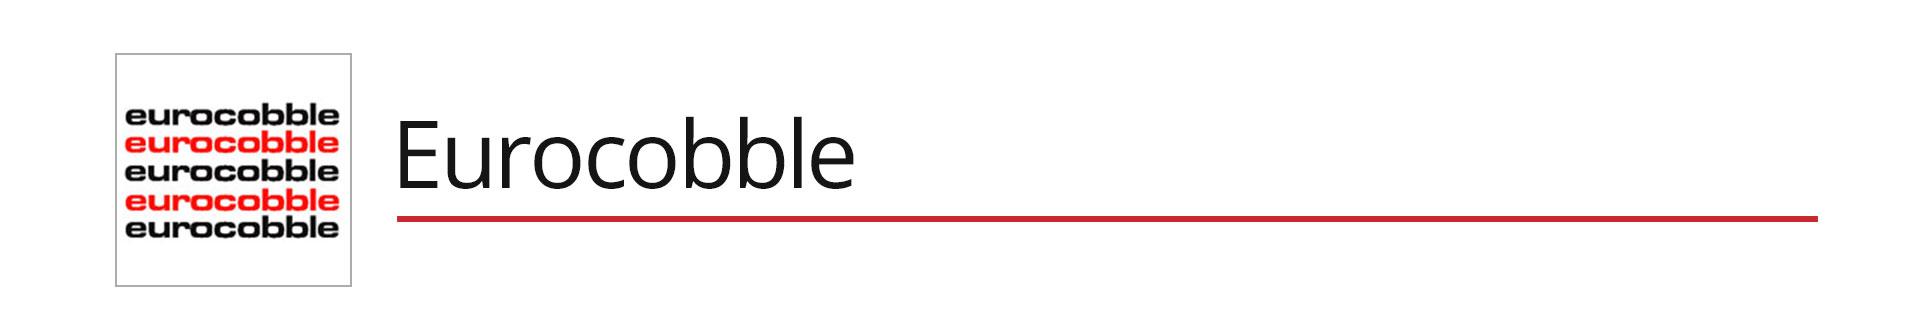 Eurocobble_CADBlock-Header.jpg